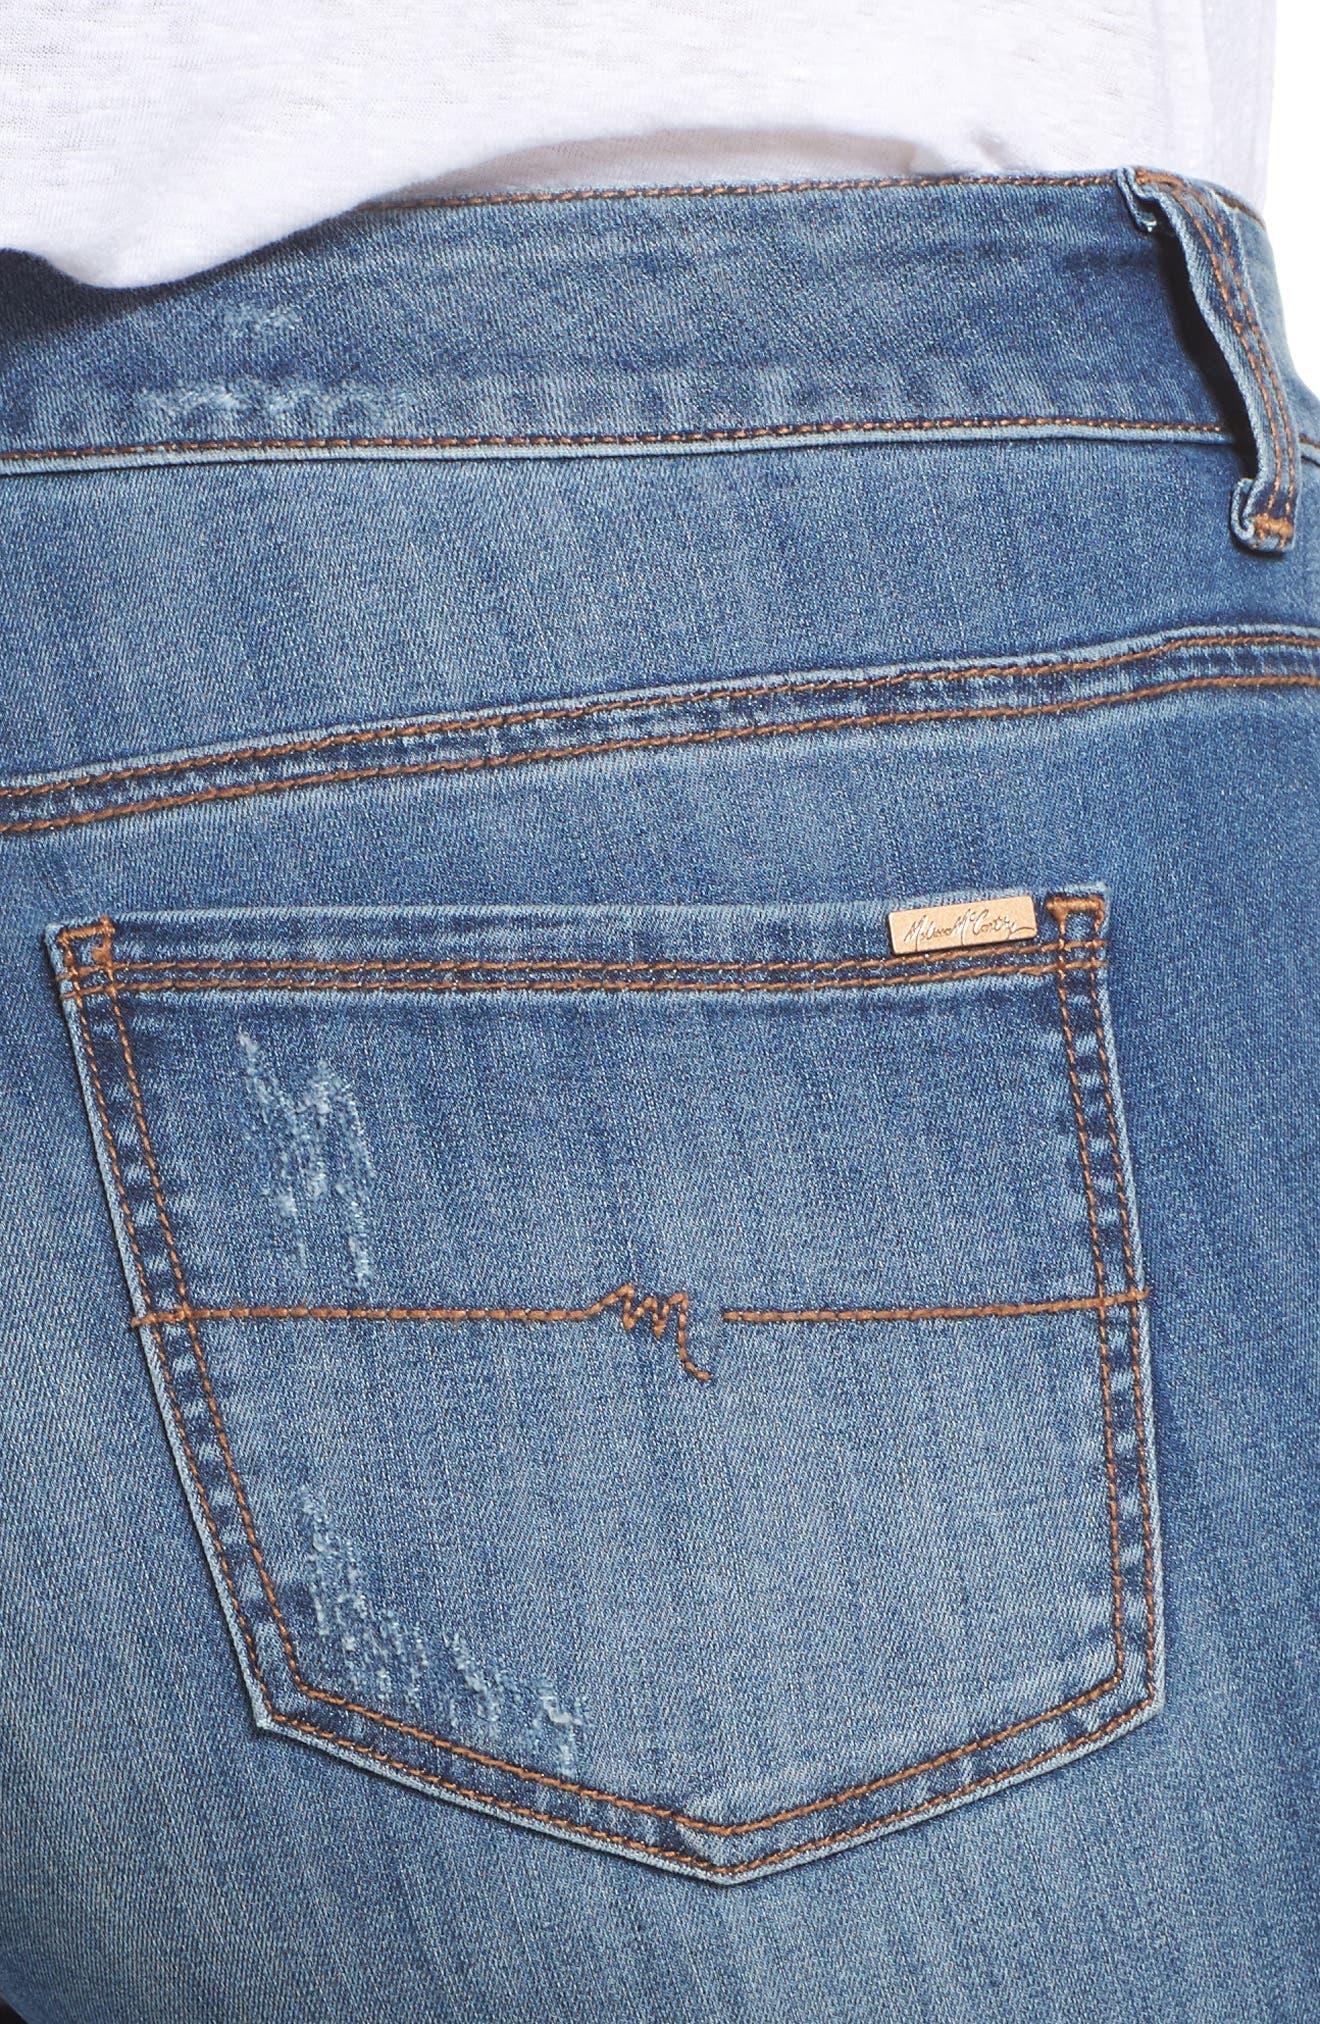 Alternate Image 4  - Melissa McCarthy Seven7 Jeweled Skinny Jeans (Heiress) (Plus Size)